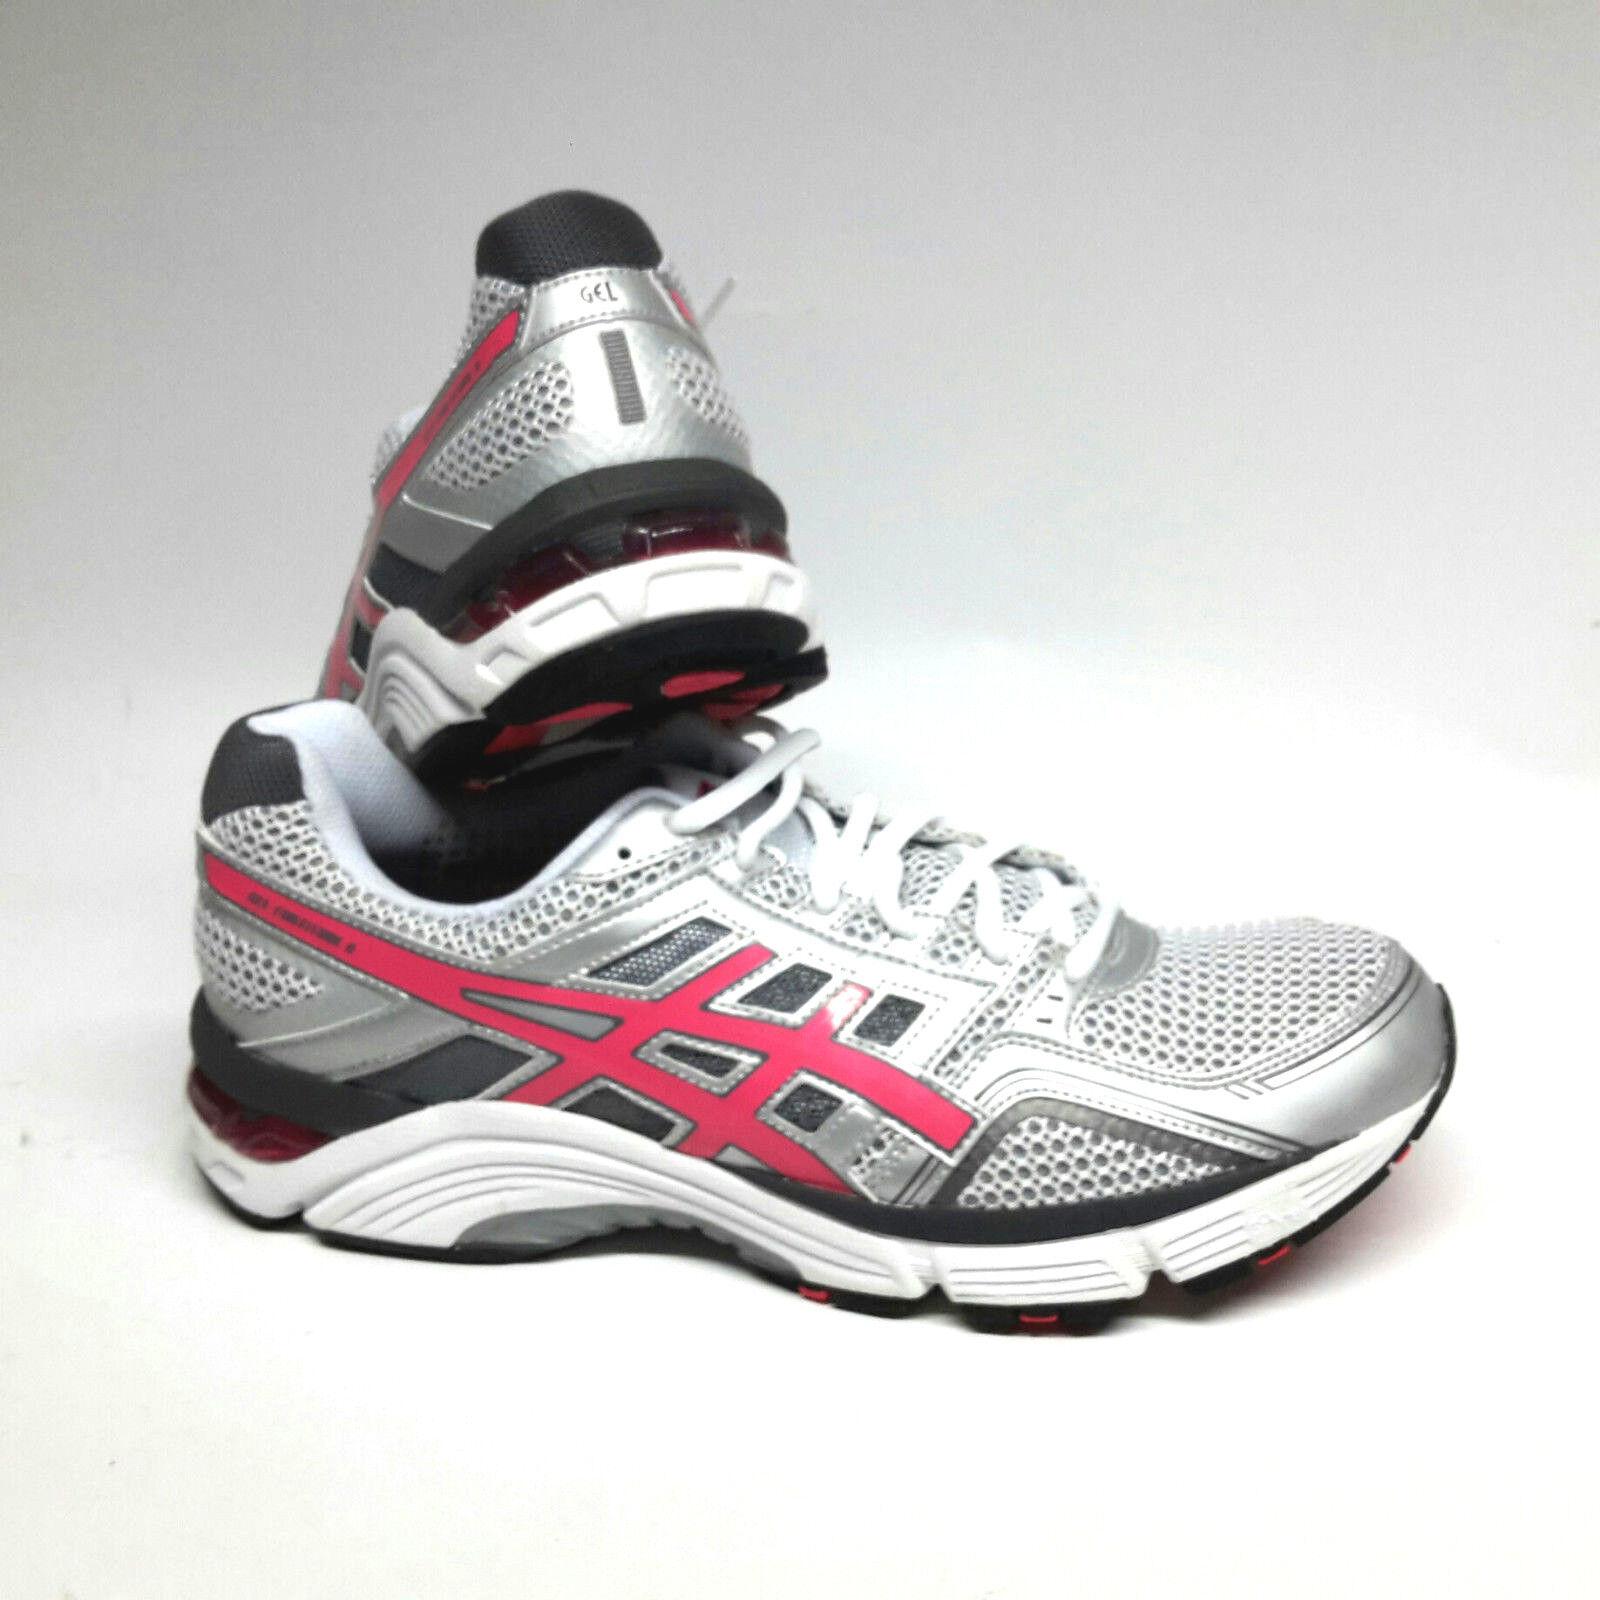 5f351cd74a0ff5 ASICS Gel Fortitude 6 Women Femmes Chaussures De Course Blanc Rose Argent T  UK 11 EUR